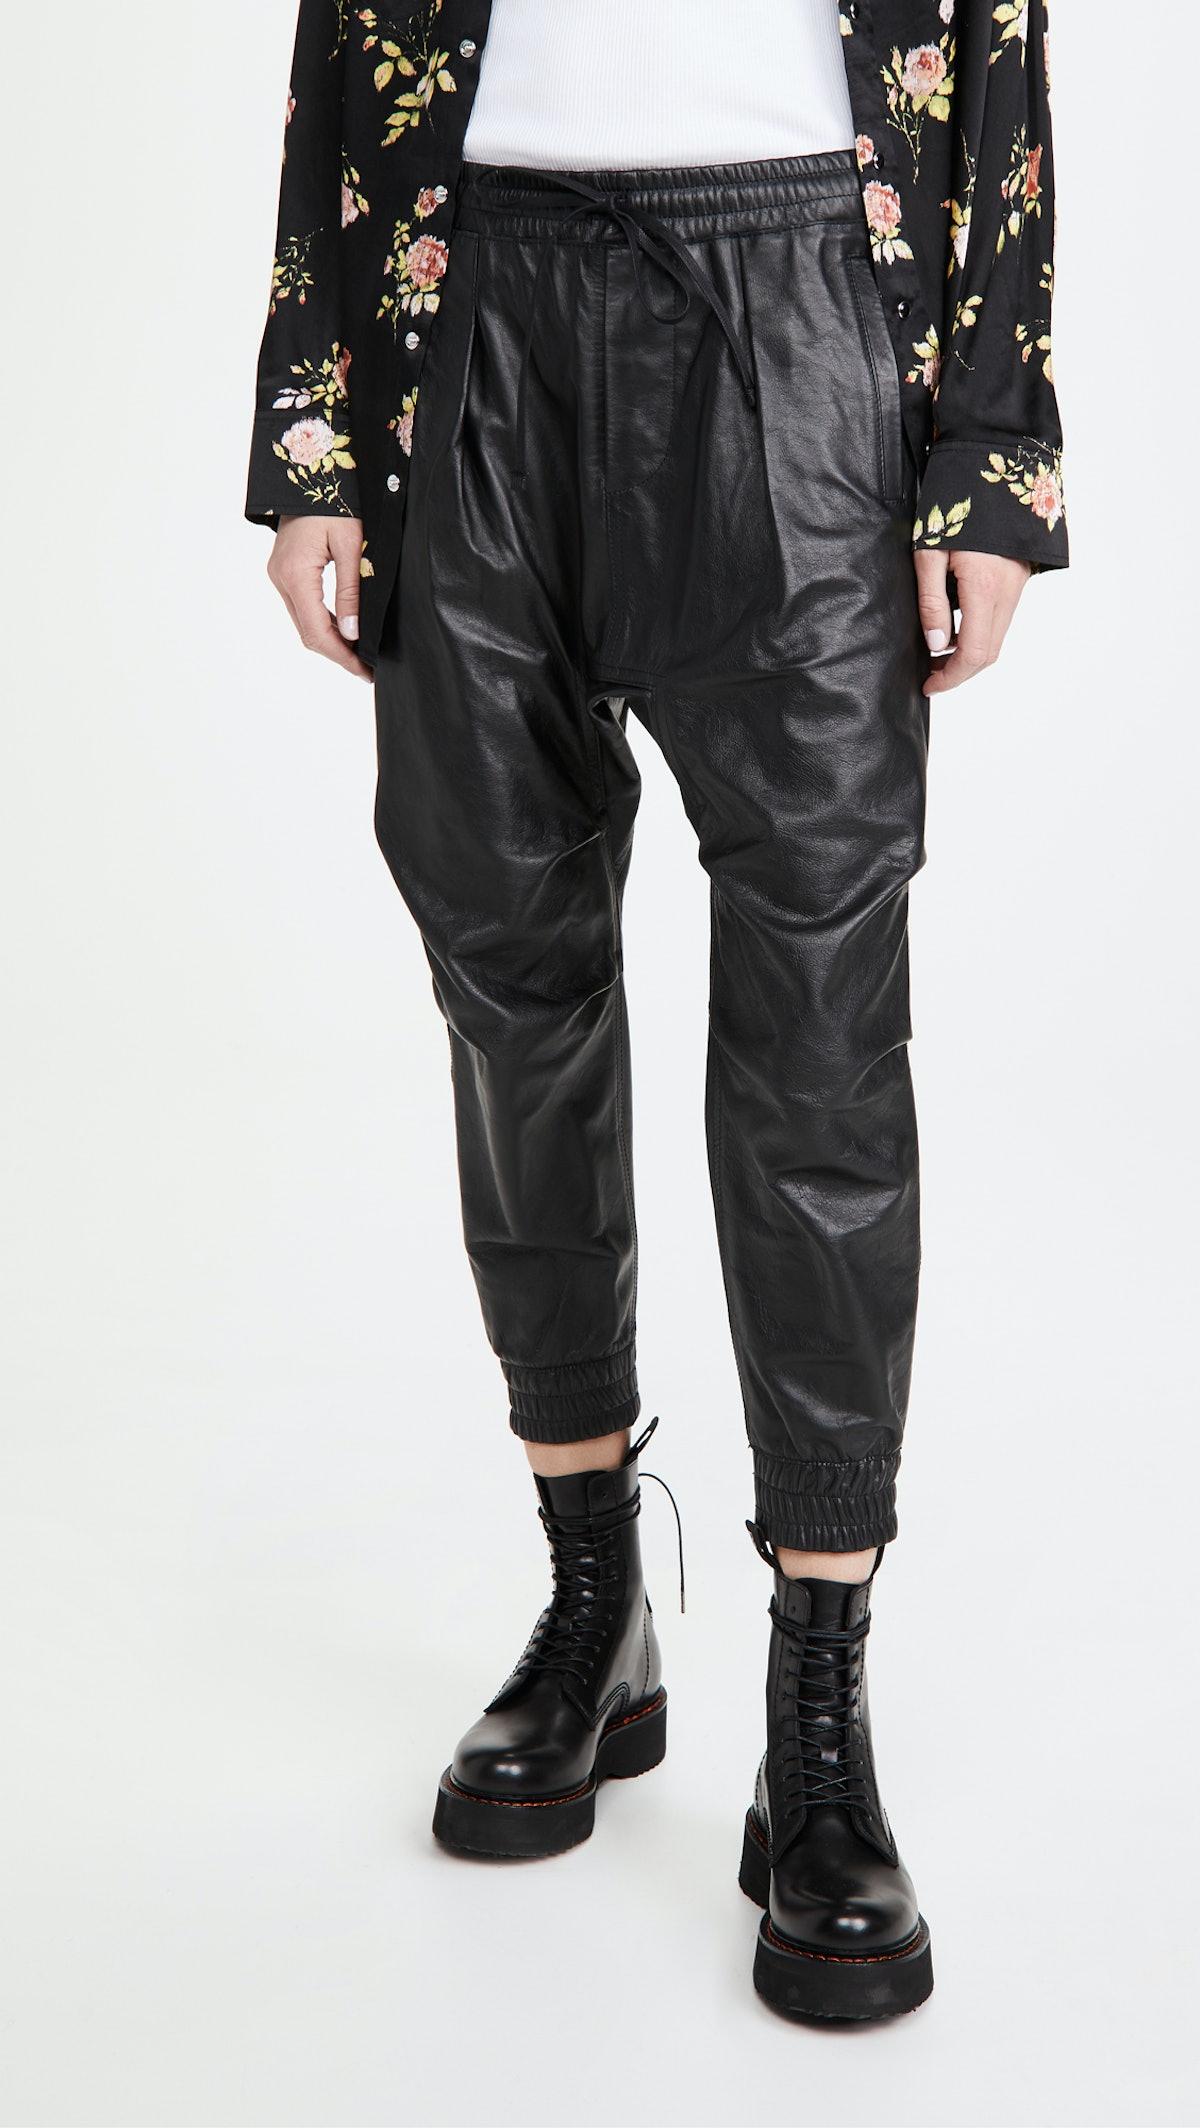 Leather Harem Pants